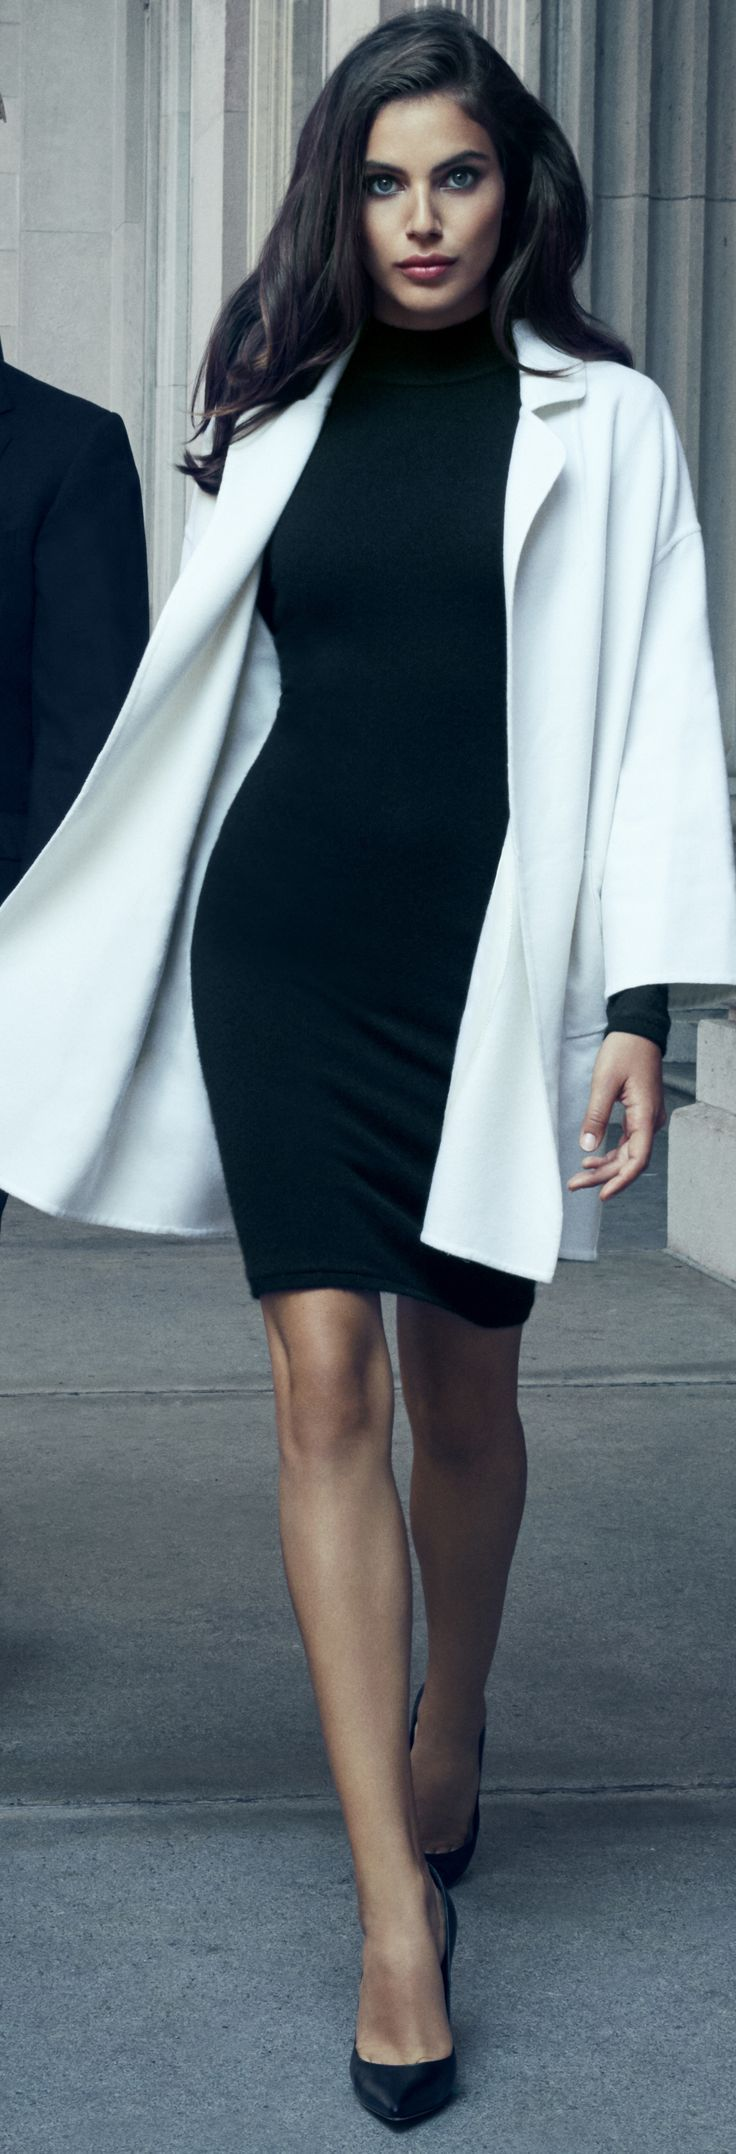 Little black dress from day to night #dressoftheday #daydress #dressupday #dress…